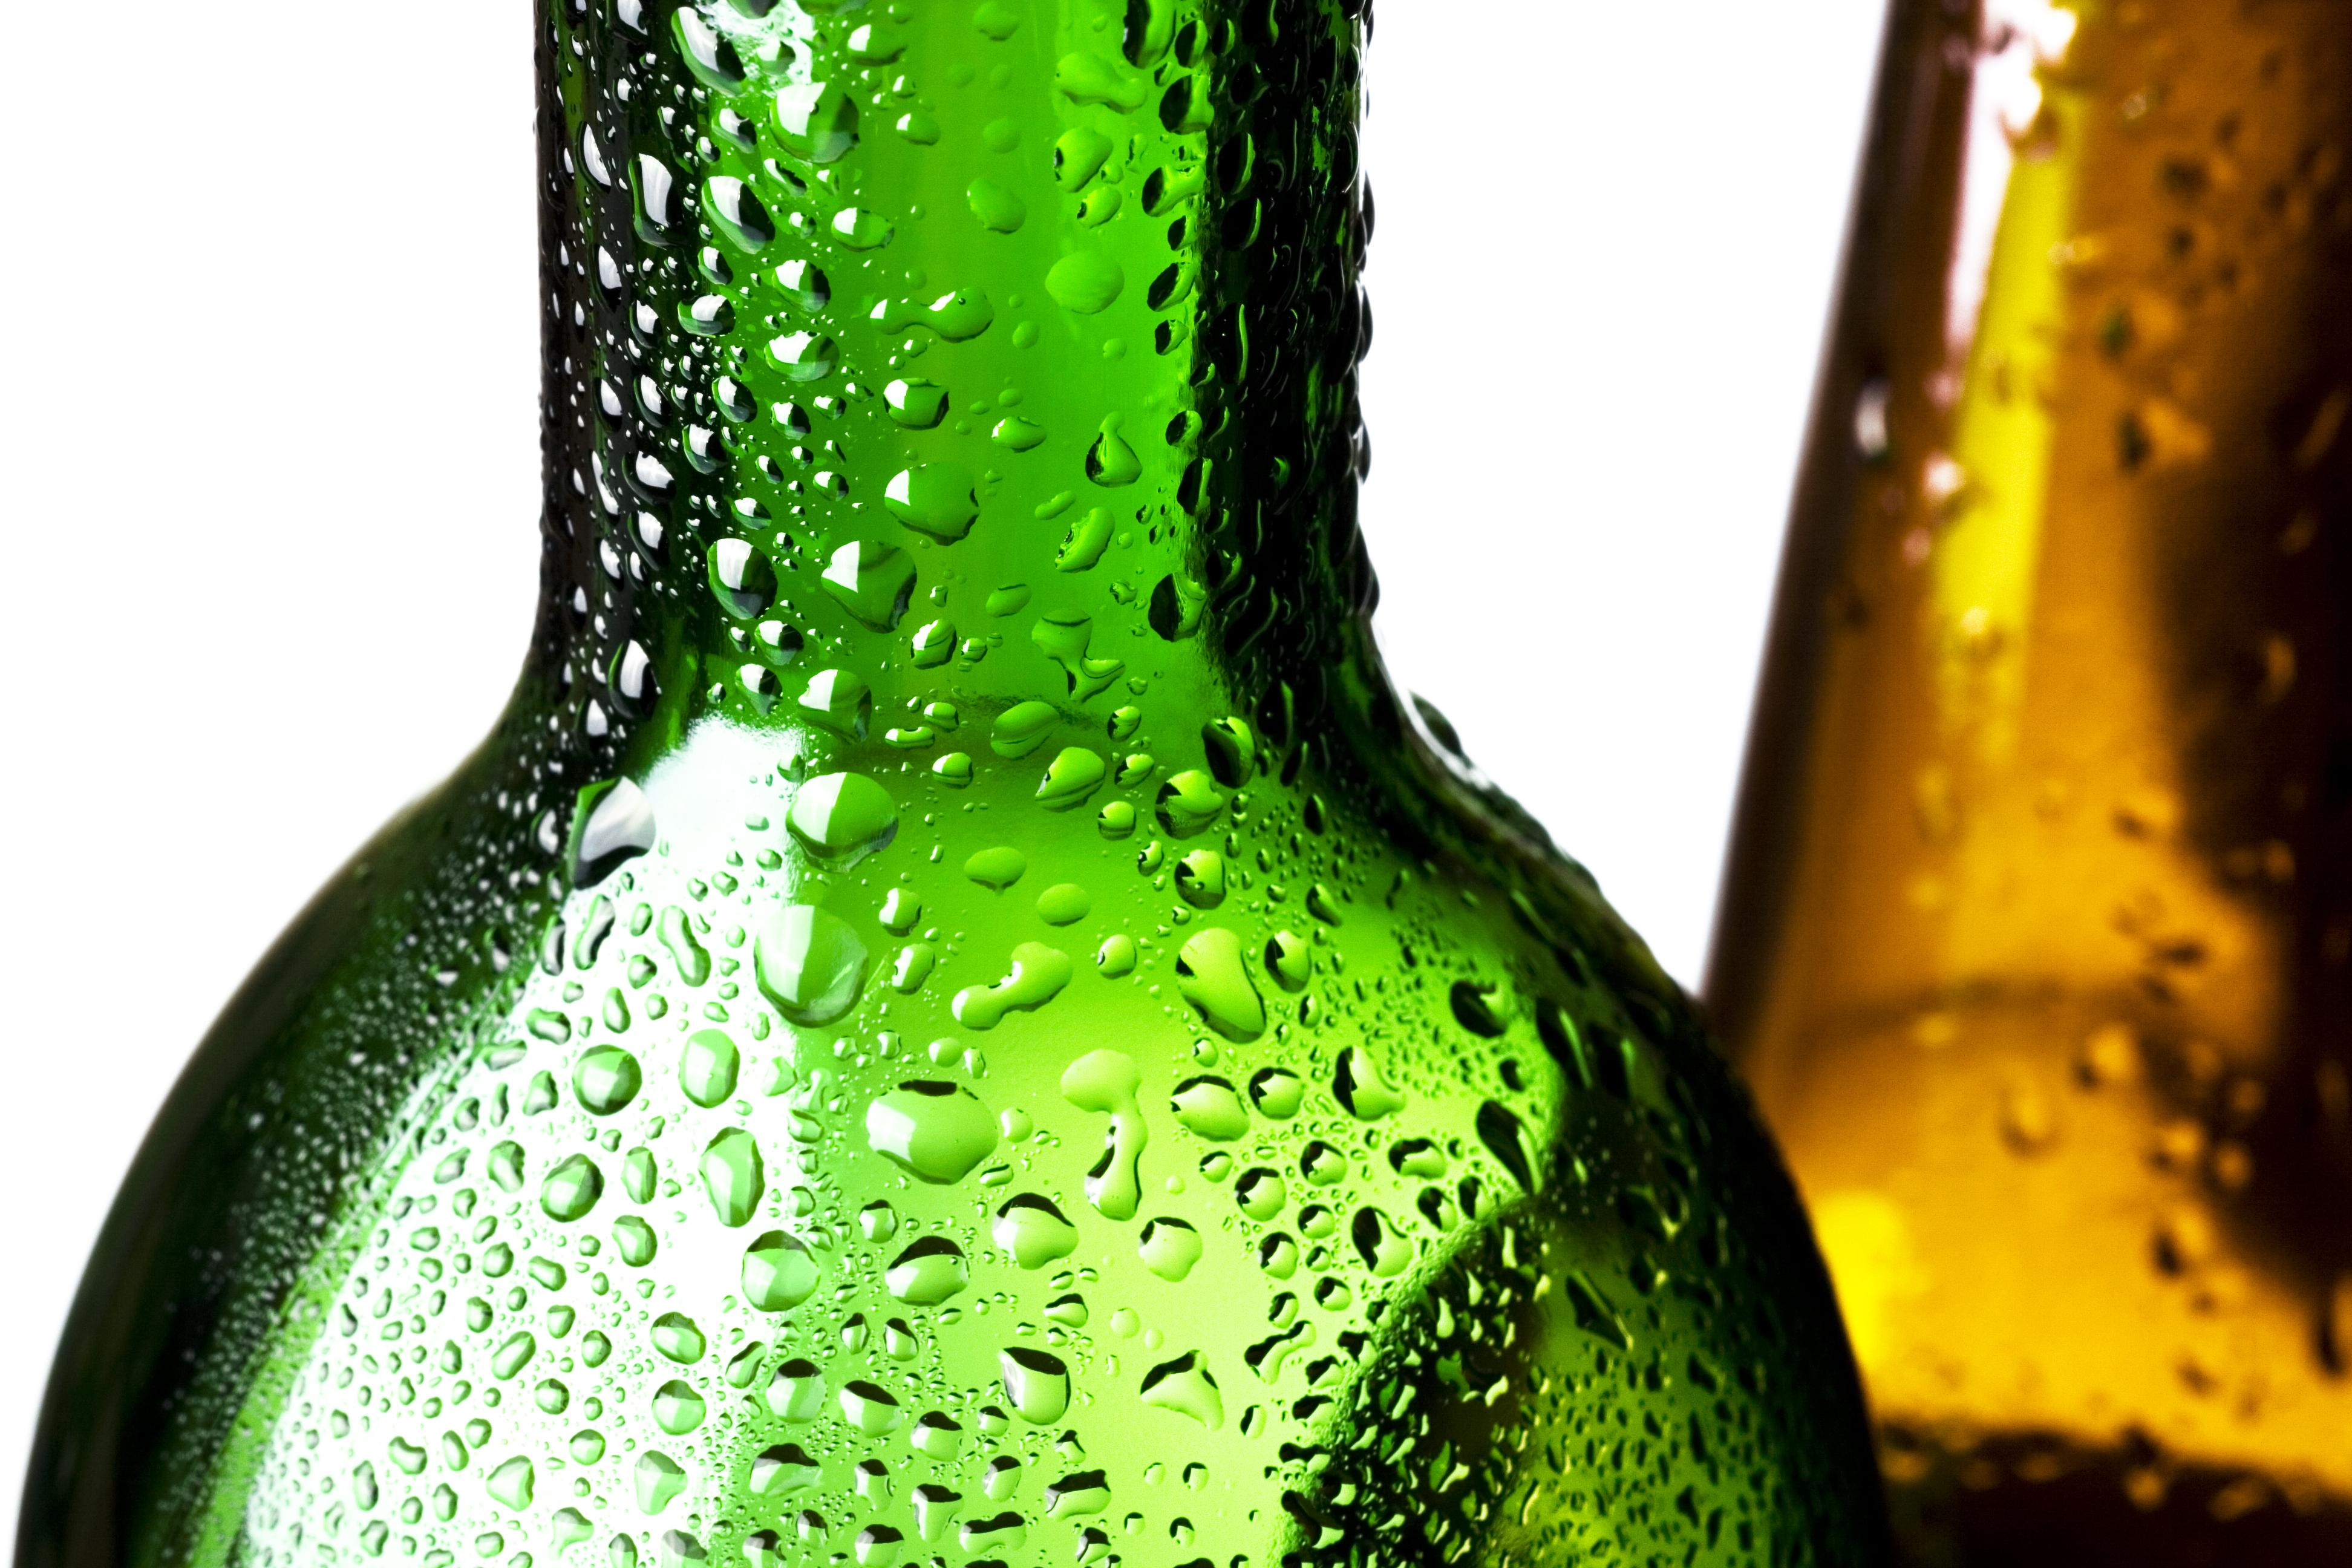 Glass bottles, Aqua, Pure, Healthy, Isolated, HQ Photo